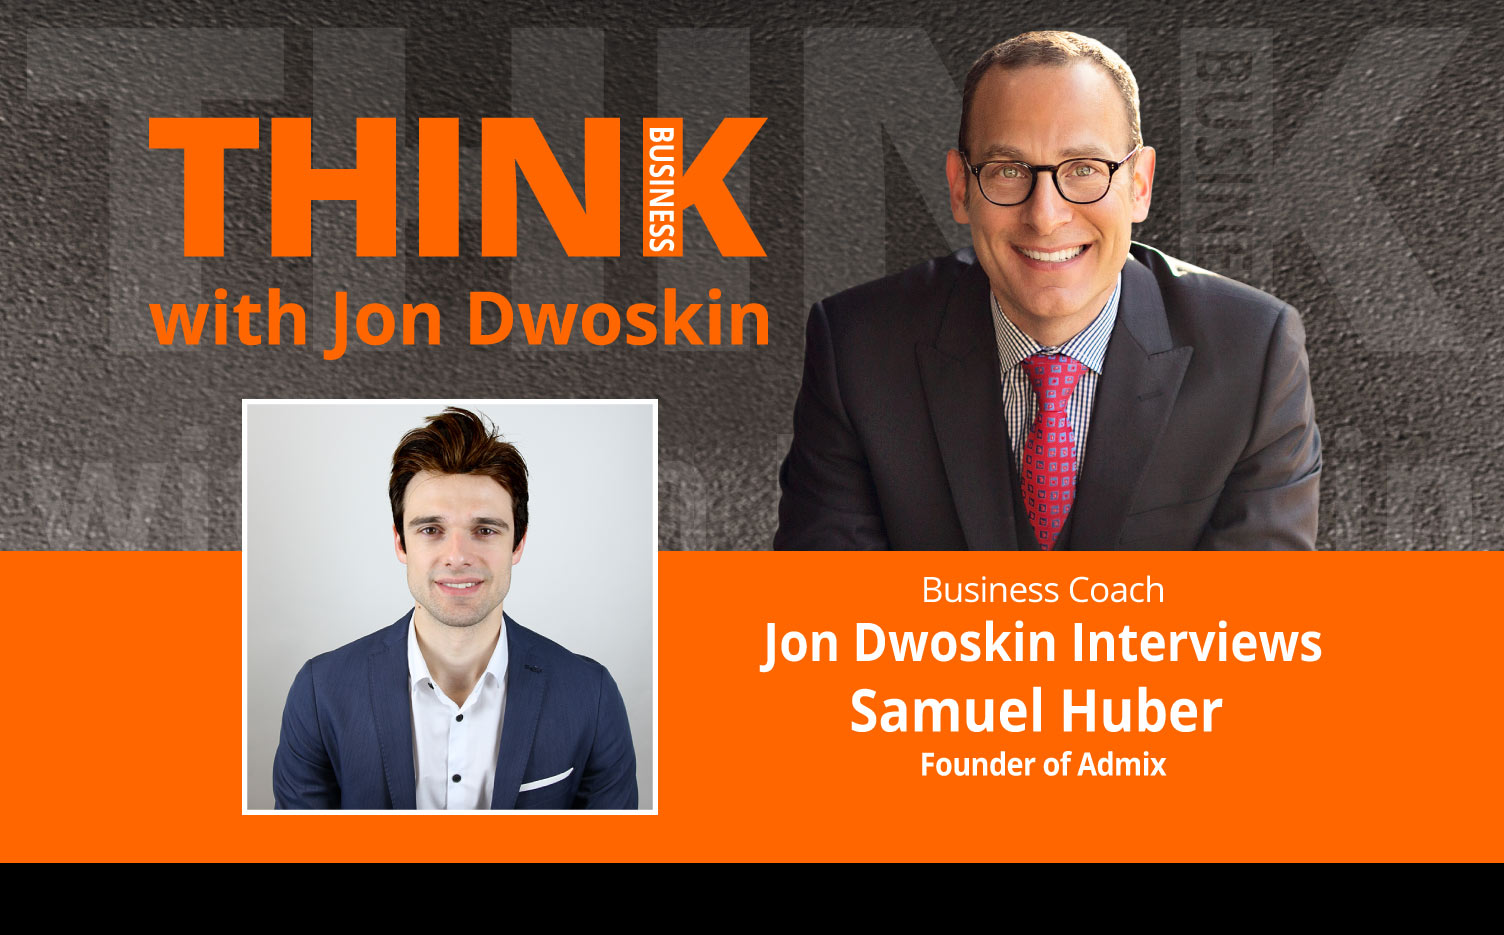 THINK Business Podcast: Jon Dwoskin Interviews Samuel Huber, Founder of Admix